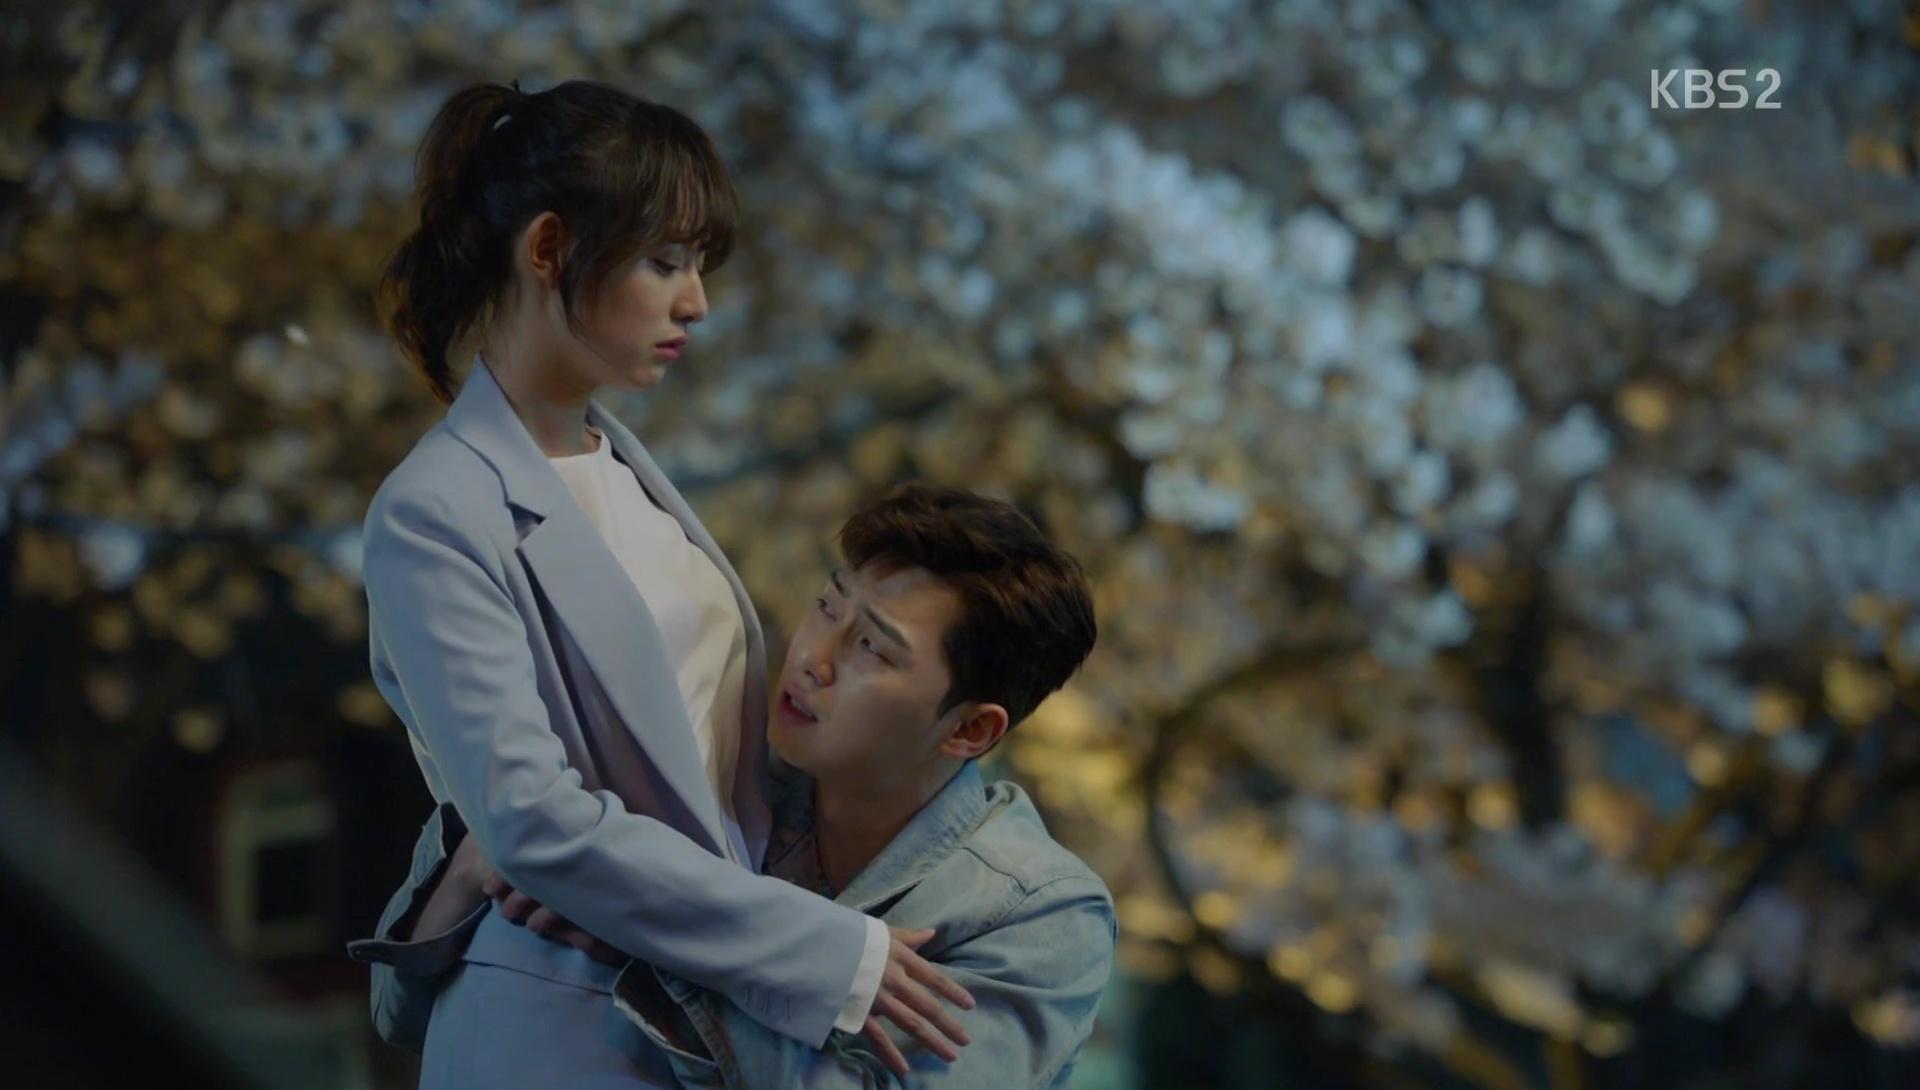 Rain kim tae hee dating allkpop meme 7